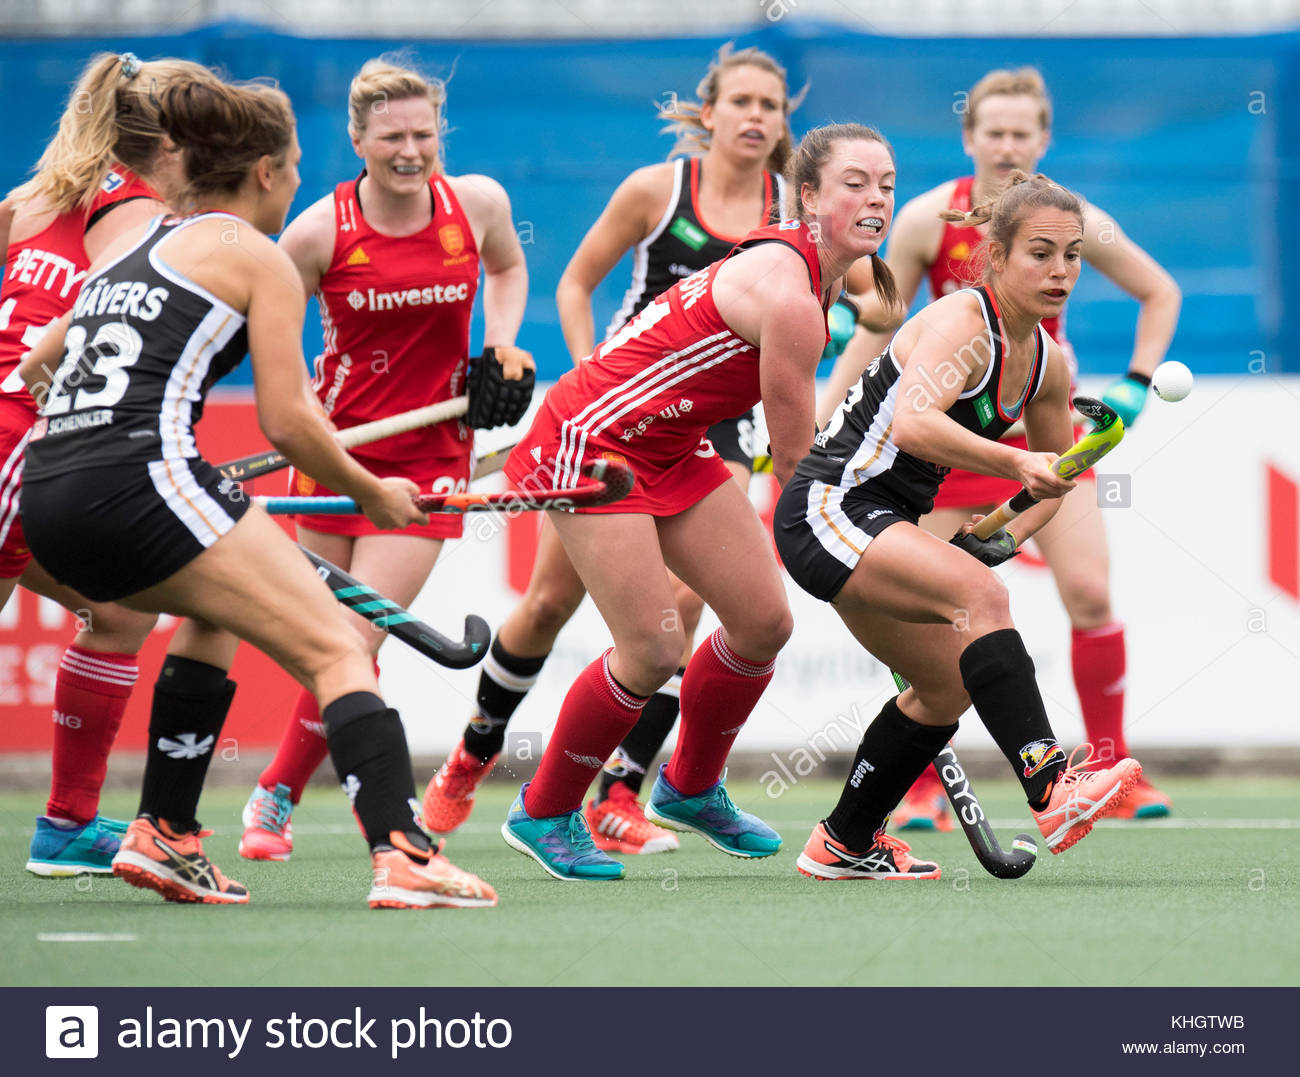 Auckland, New Zealand. 18th Nov, 2017. The German player Lisa Altenburg (R) during the women's hockey World League Stock Photo